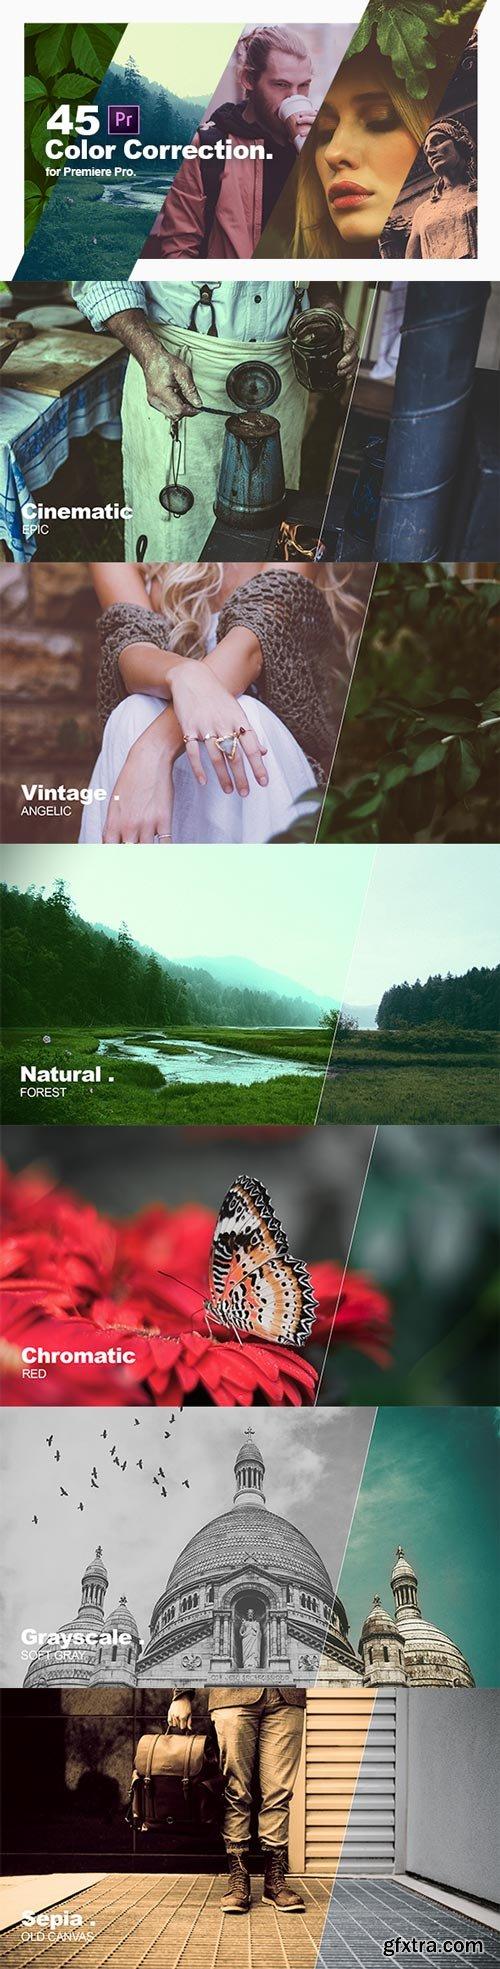 Videohive - Color Correction & Color Grading Presets for Premiere Pro - 21777710